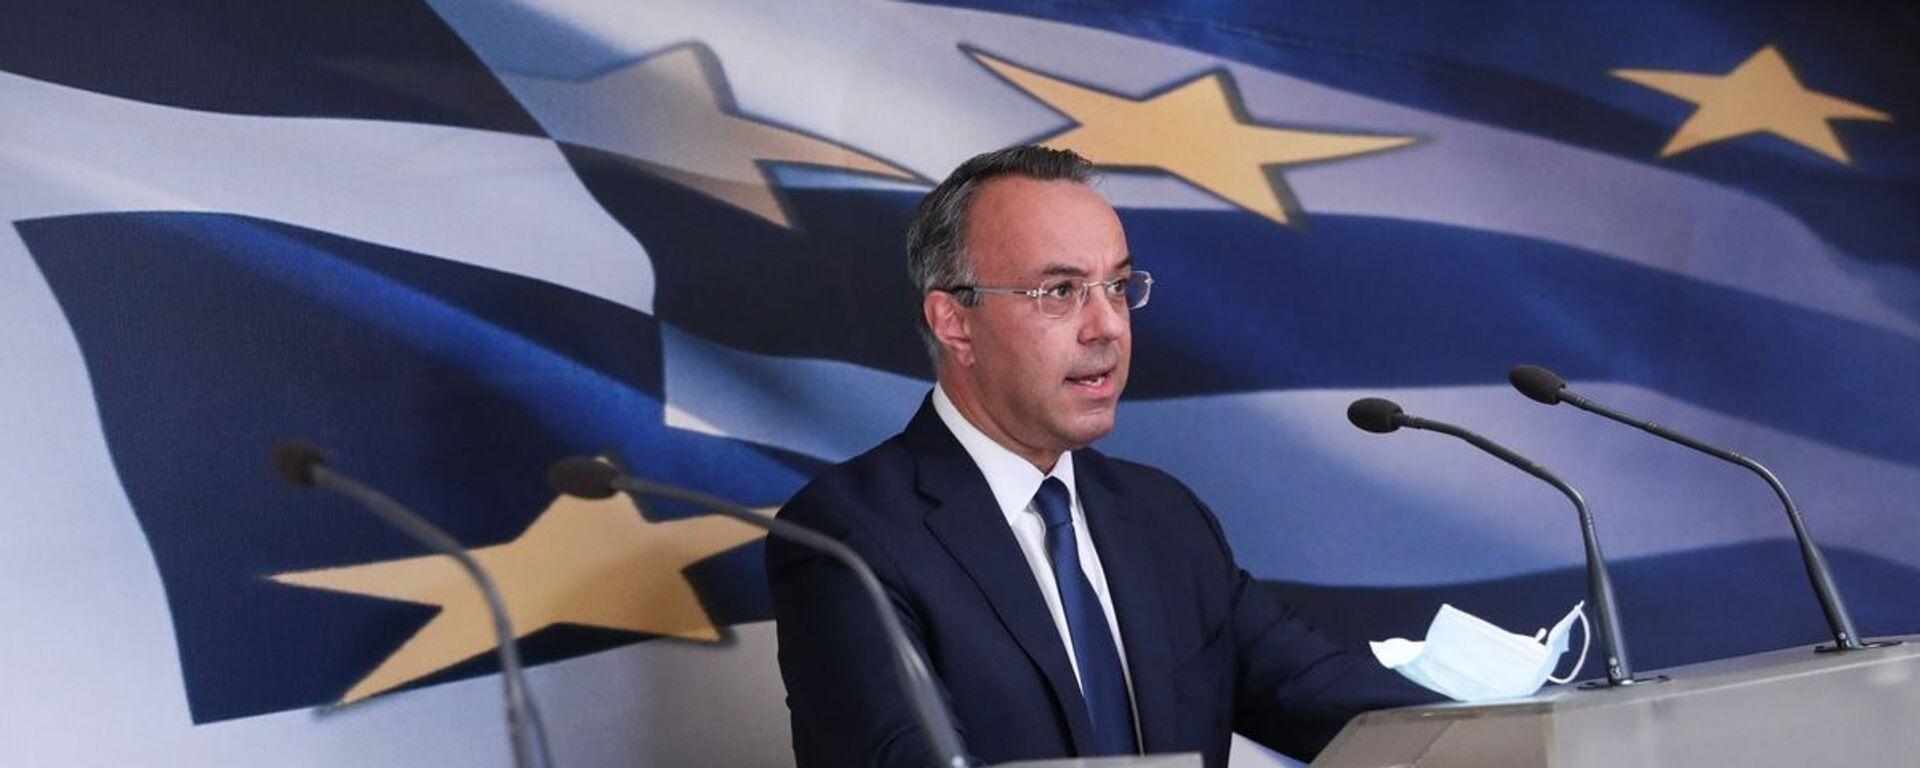 O υπουργός Οικονομικών, Χρήστος Σταϊκούρας - Sputnik Ελλάδα, 1920, 08.10.2021